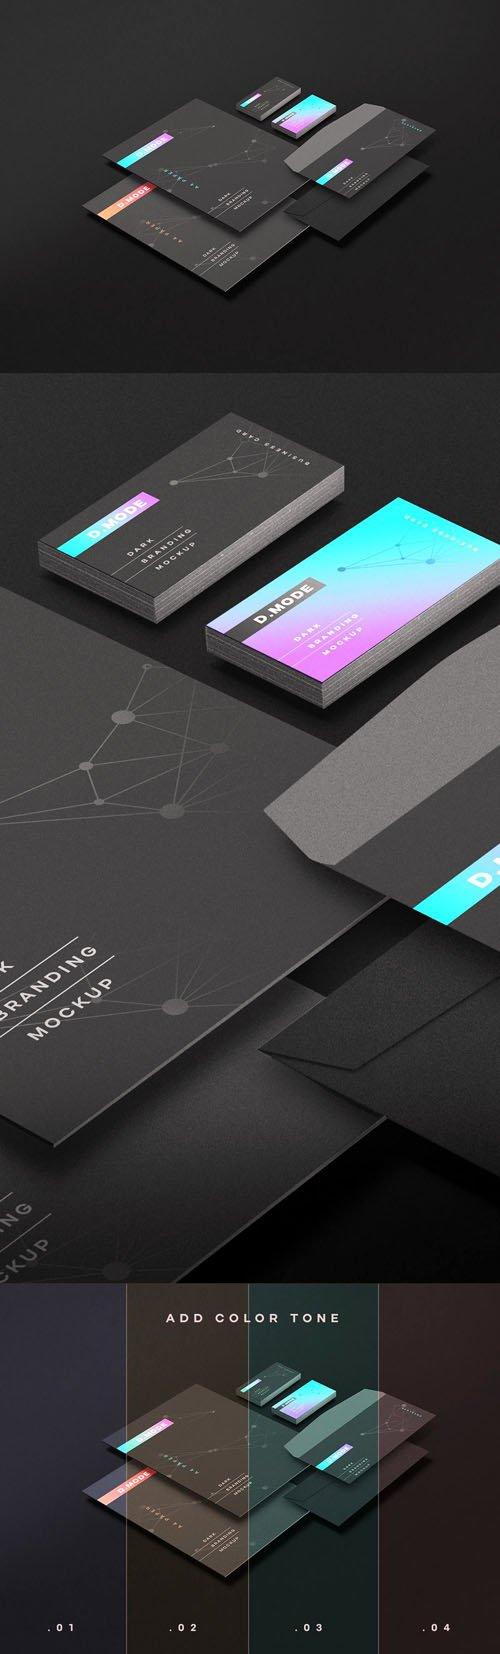 Dark Branding PSD Mockups